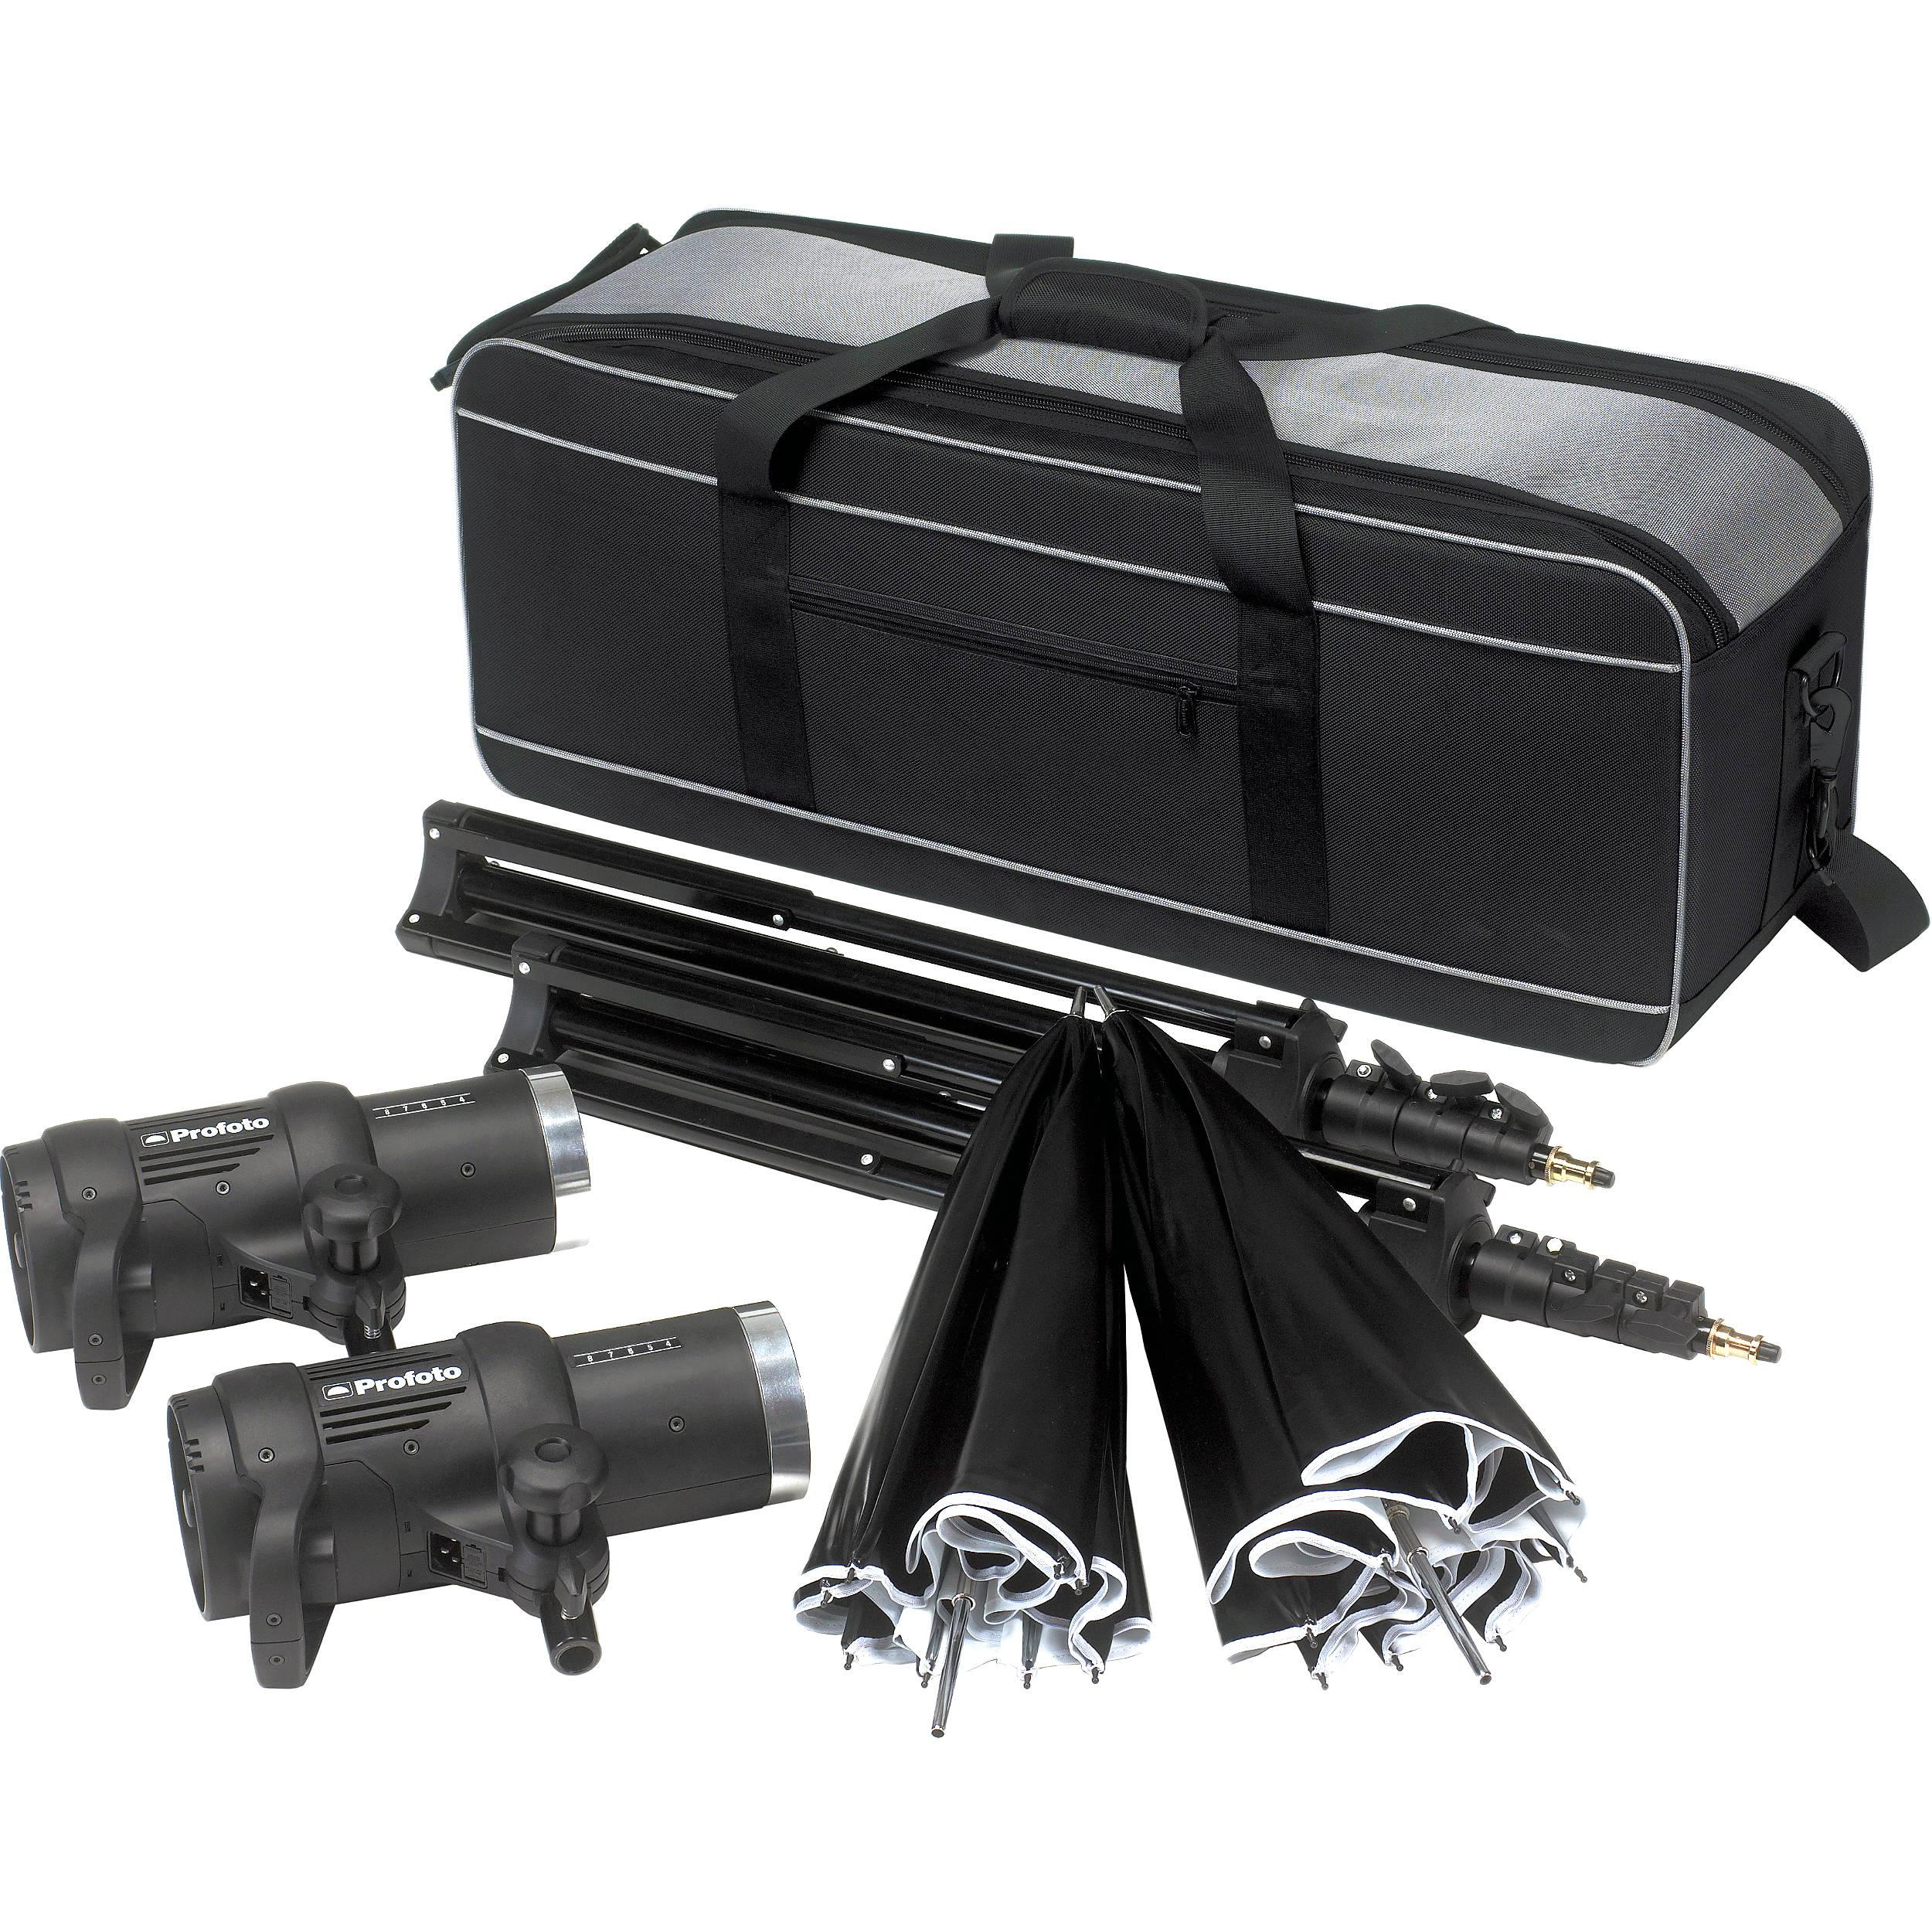 Profoto Studio Lighting Kit: Profoto D1 Air 250Ws 2-Monolight Studio Kit W/o Remote 901055